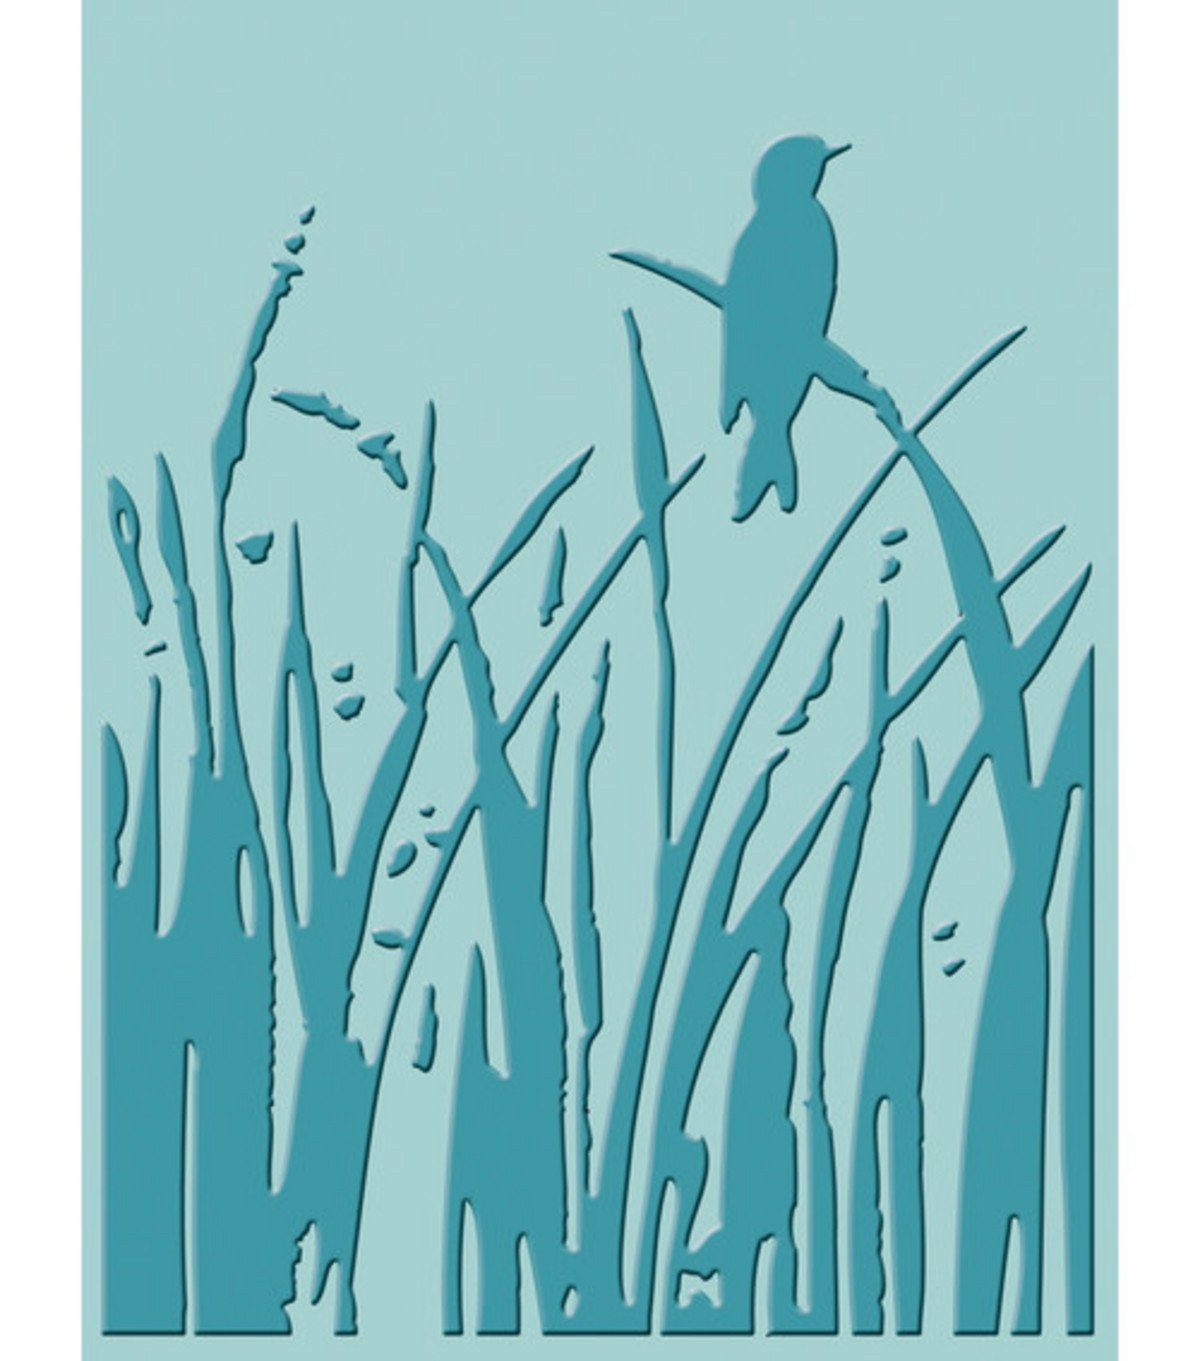 CuttleBug 371169 Dossier de Gaufrage A2 Bird Call 0, 96 x 11, 7 x 20, 9 cm 37-1169